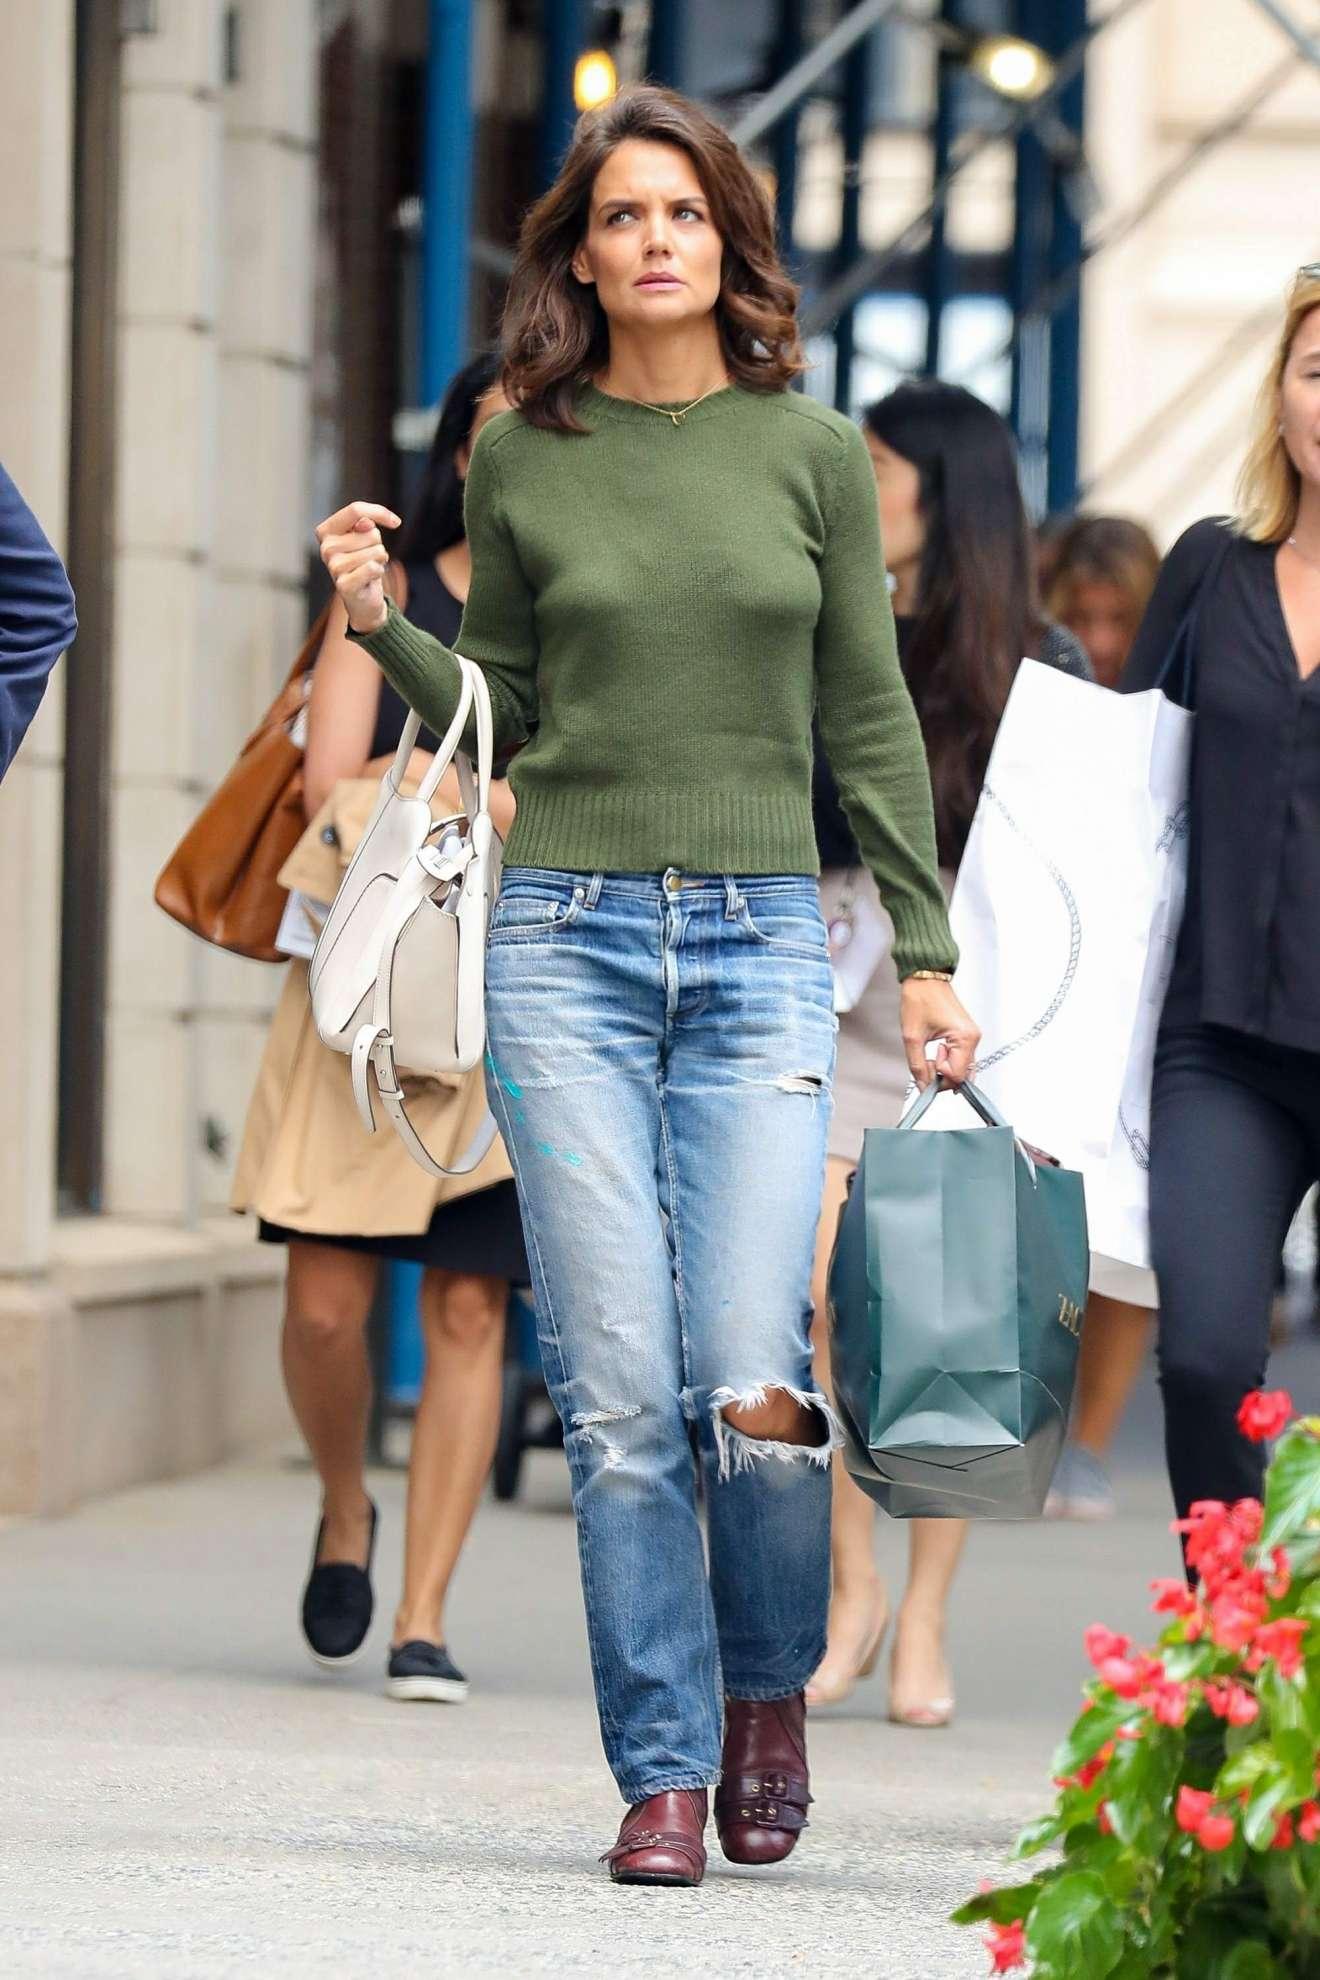 Katie Holmes Shopping Candids At Zac Posen In New York